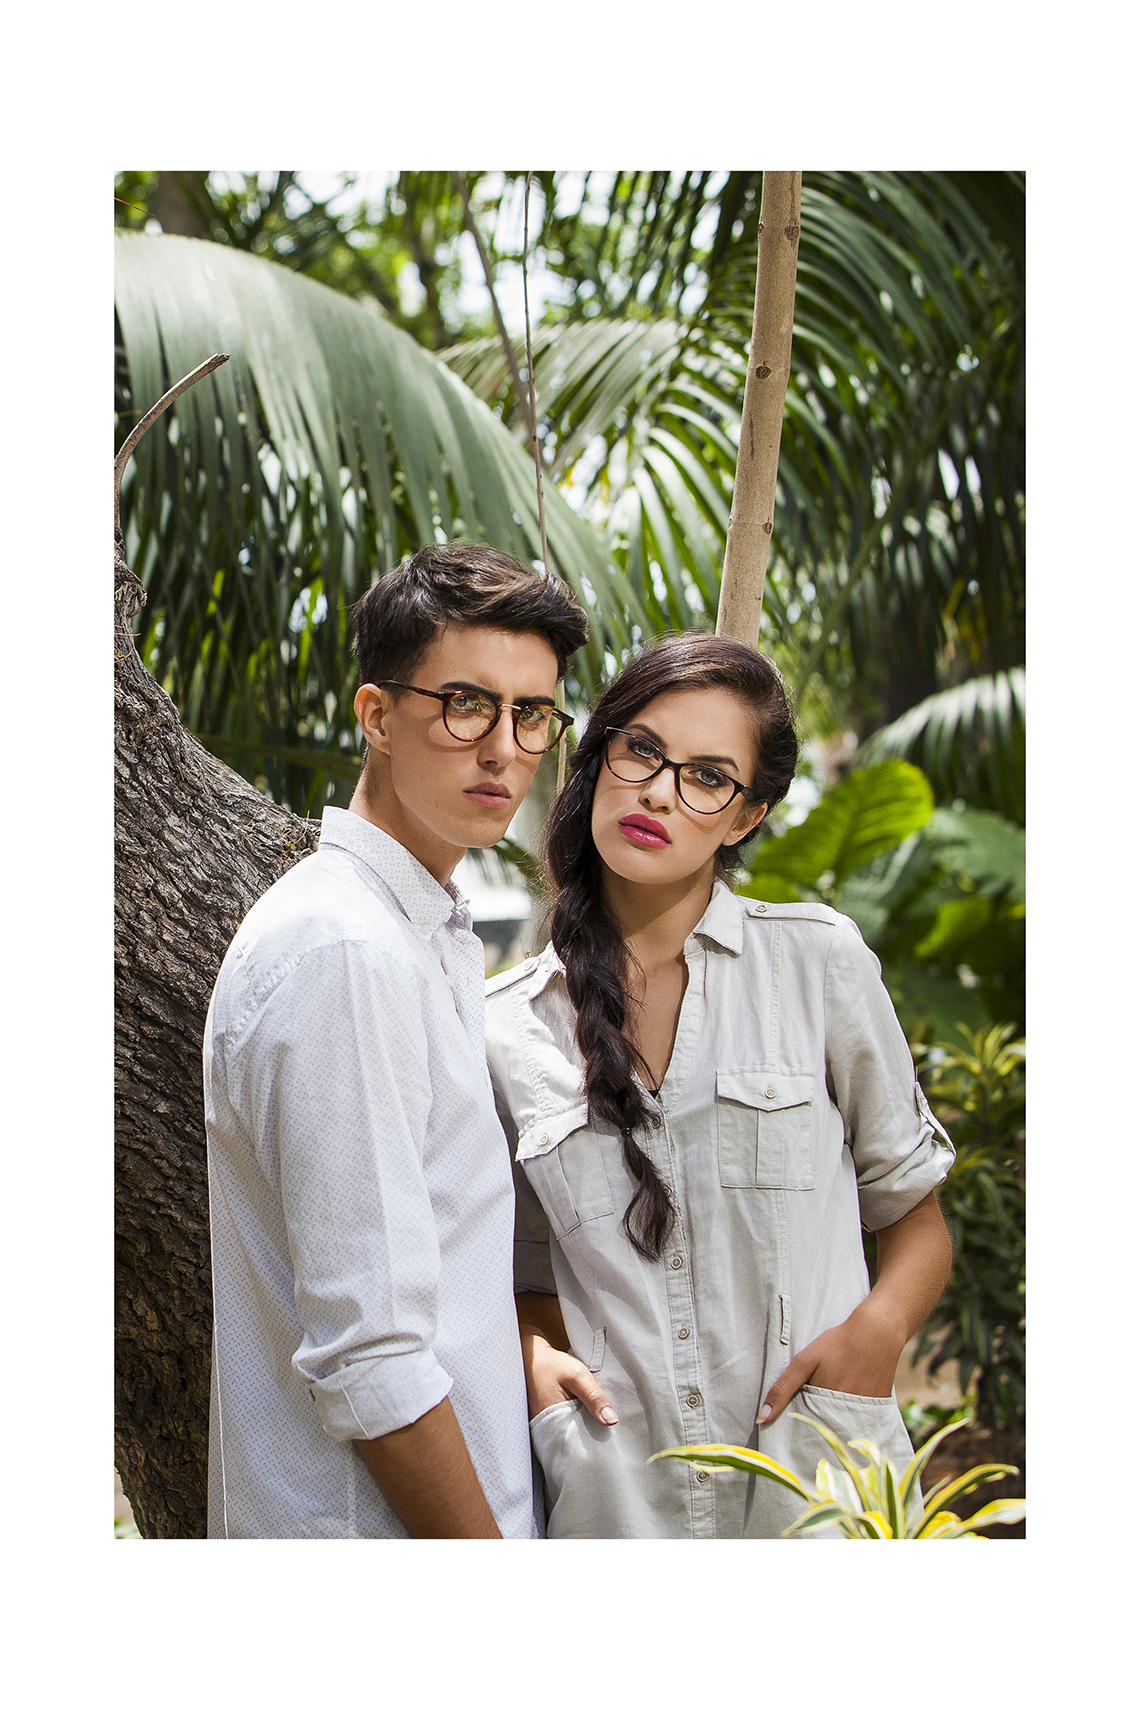 fotografia-moda-publicidad-marbella-soloptical-retoquejuanjo_MG_6391